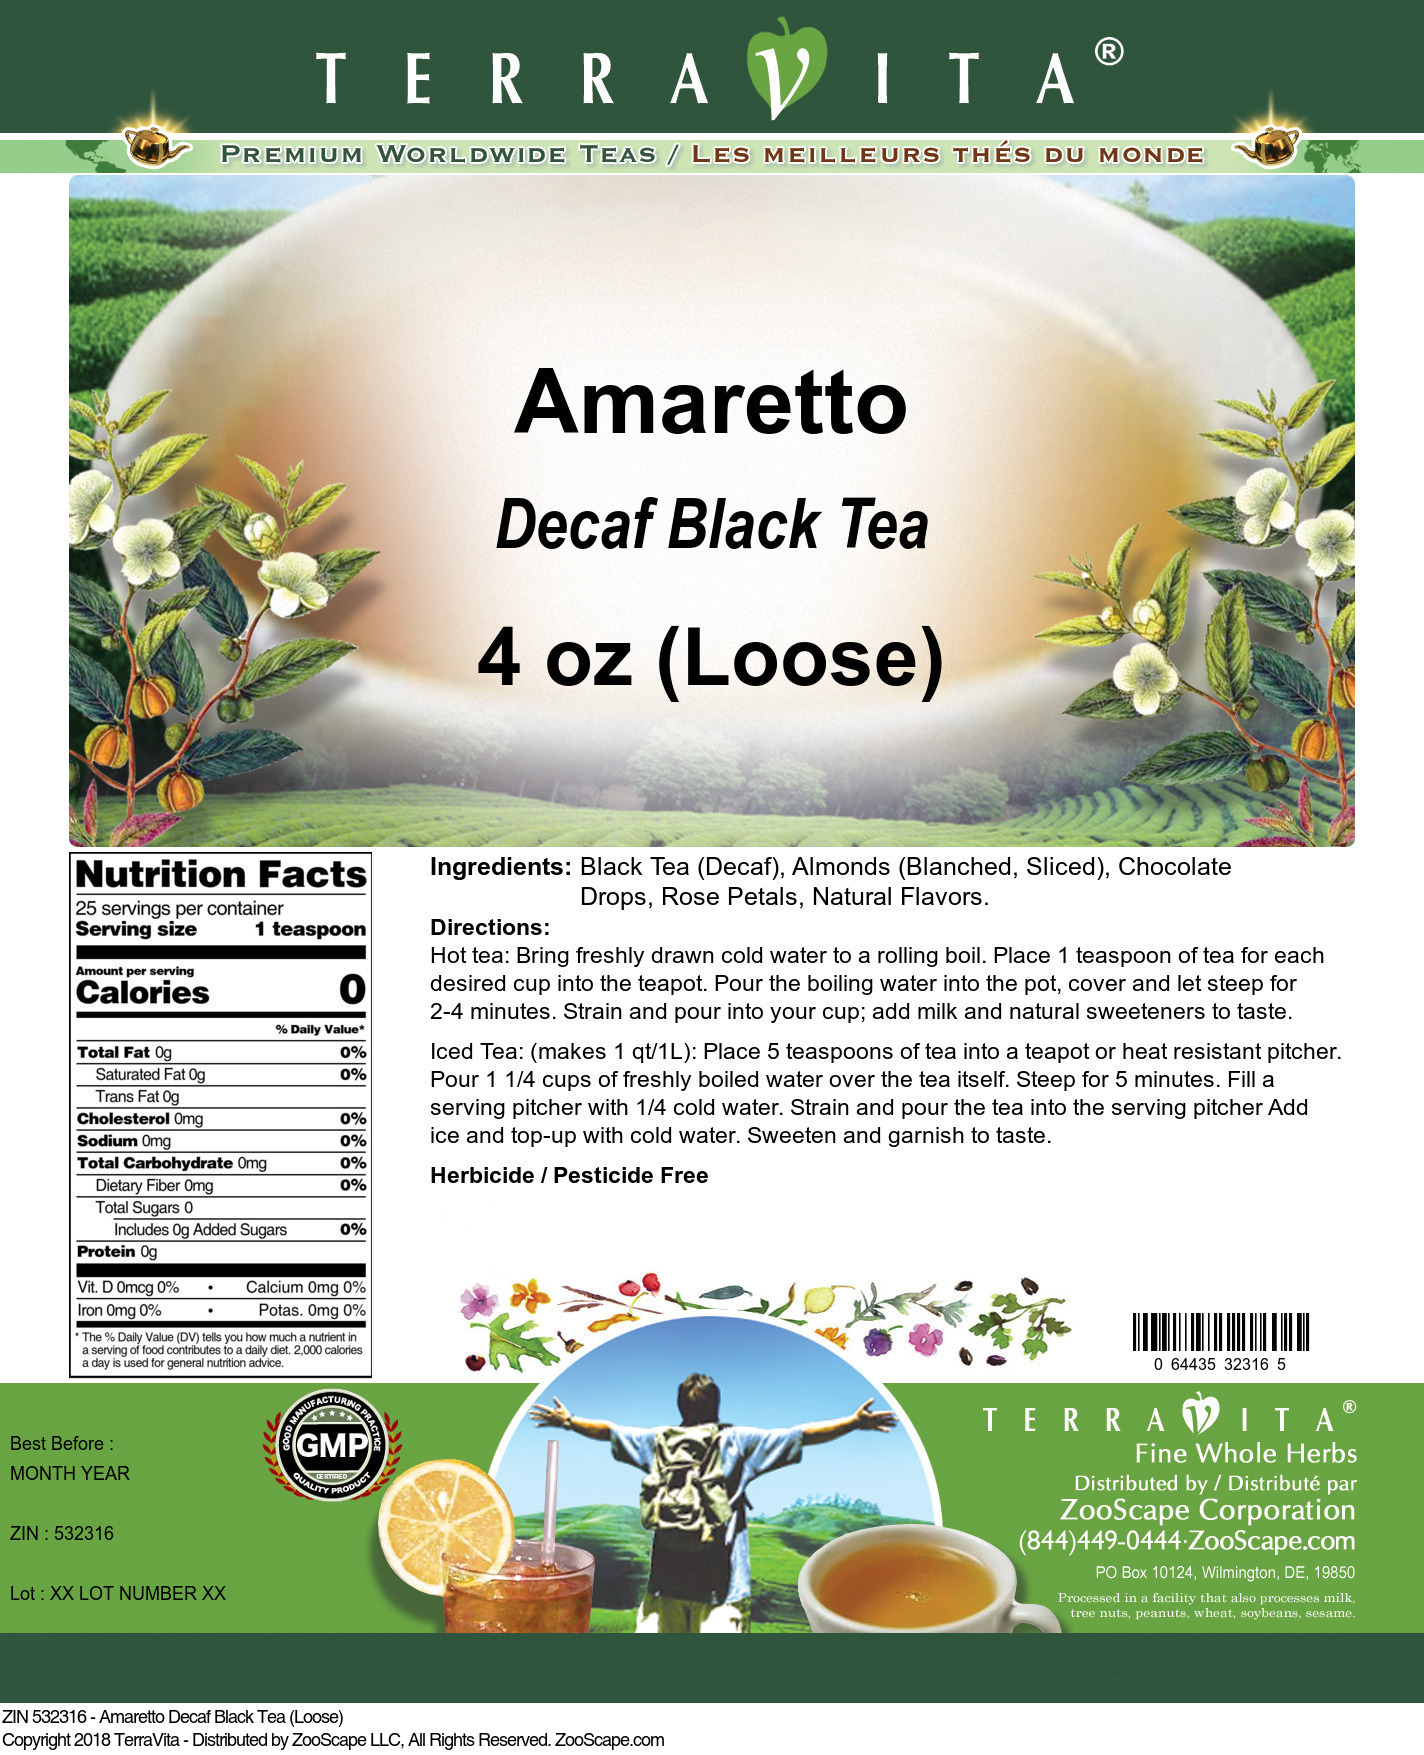 Amaretto Decaf Black Tea (Loose)